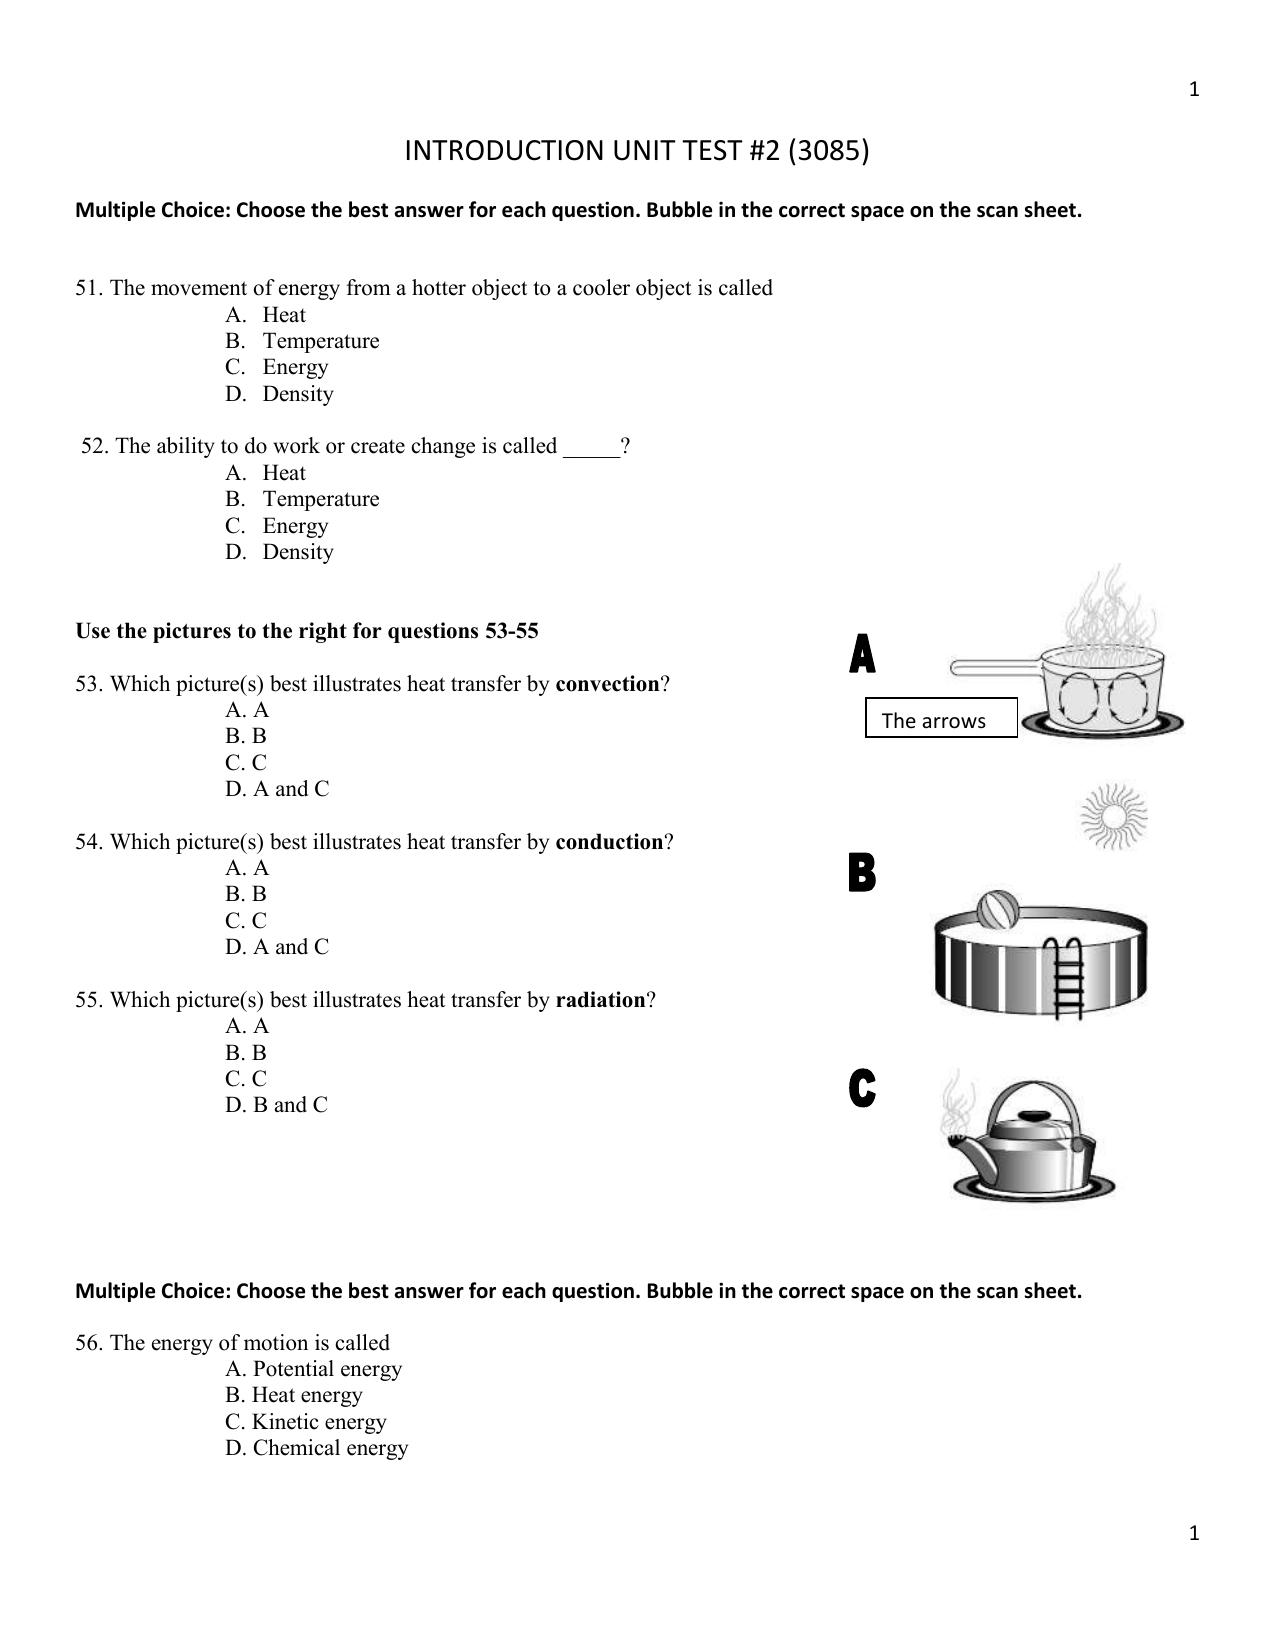 INTRODUCTION UNIT TEST #2 (3085) Multiple Choice: Choose the